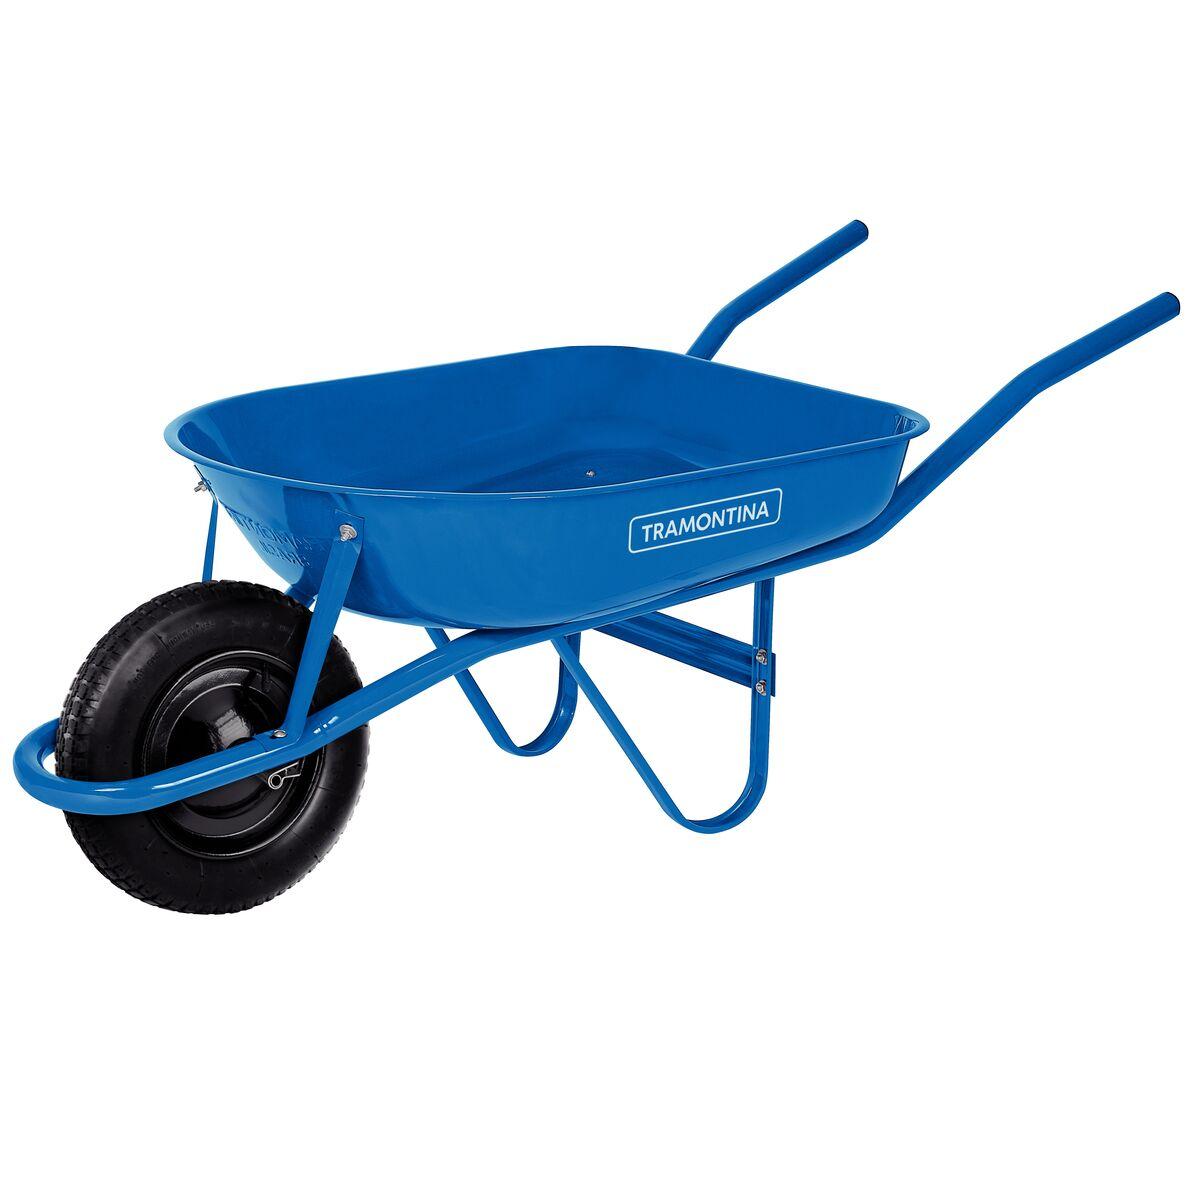 Carretilla de Mano Tramontina con Caja Rasa Metálica Azul 50 L, Brazo Metálico e Llanta con Cámara